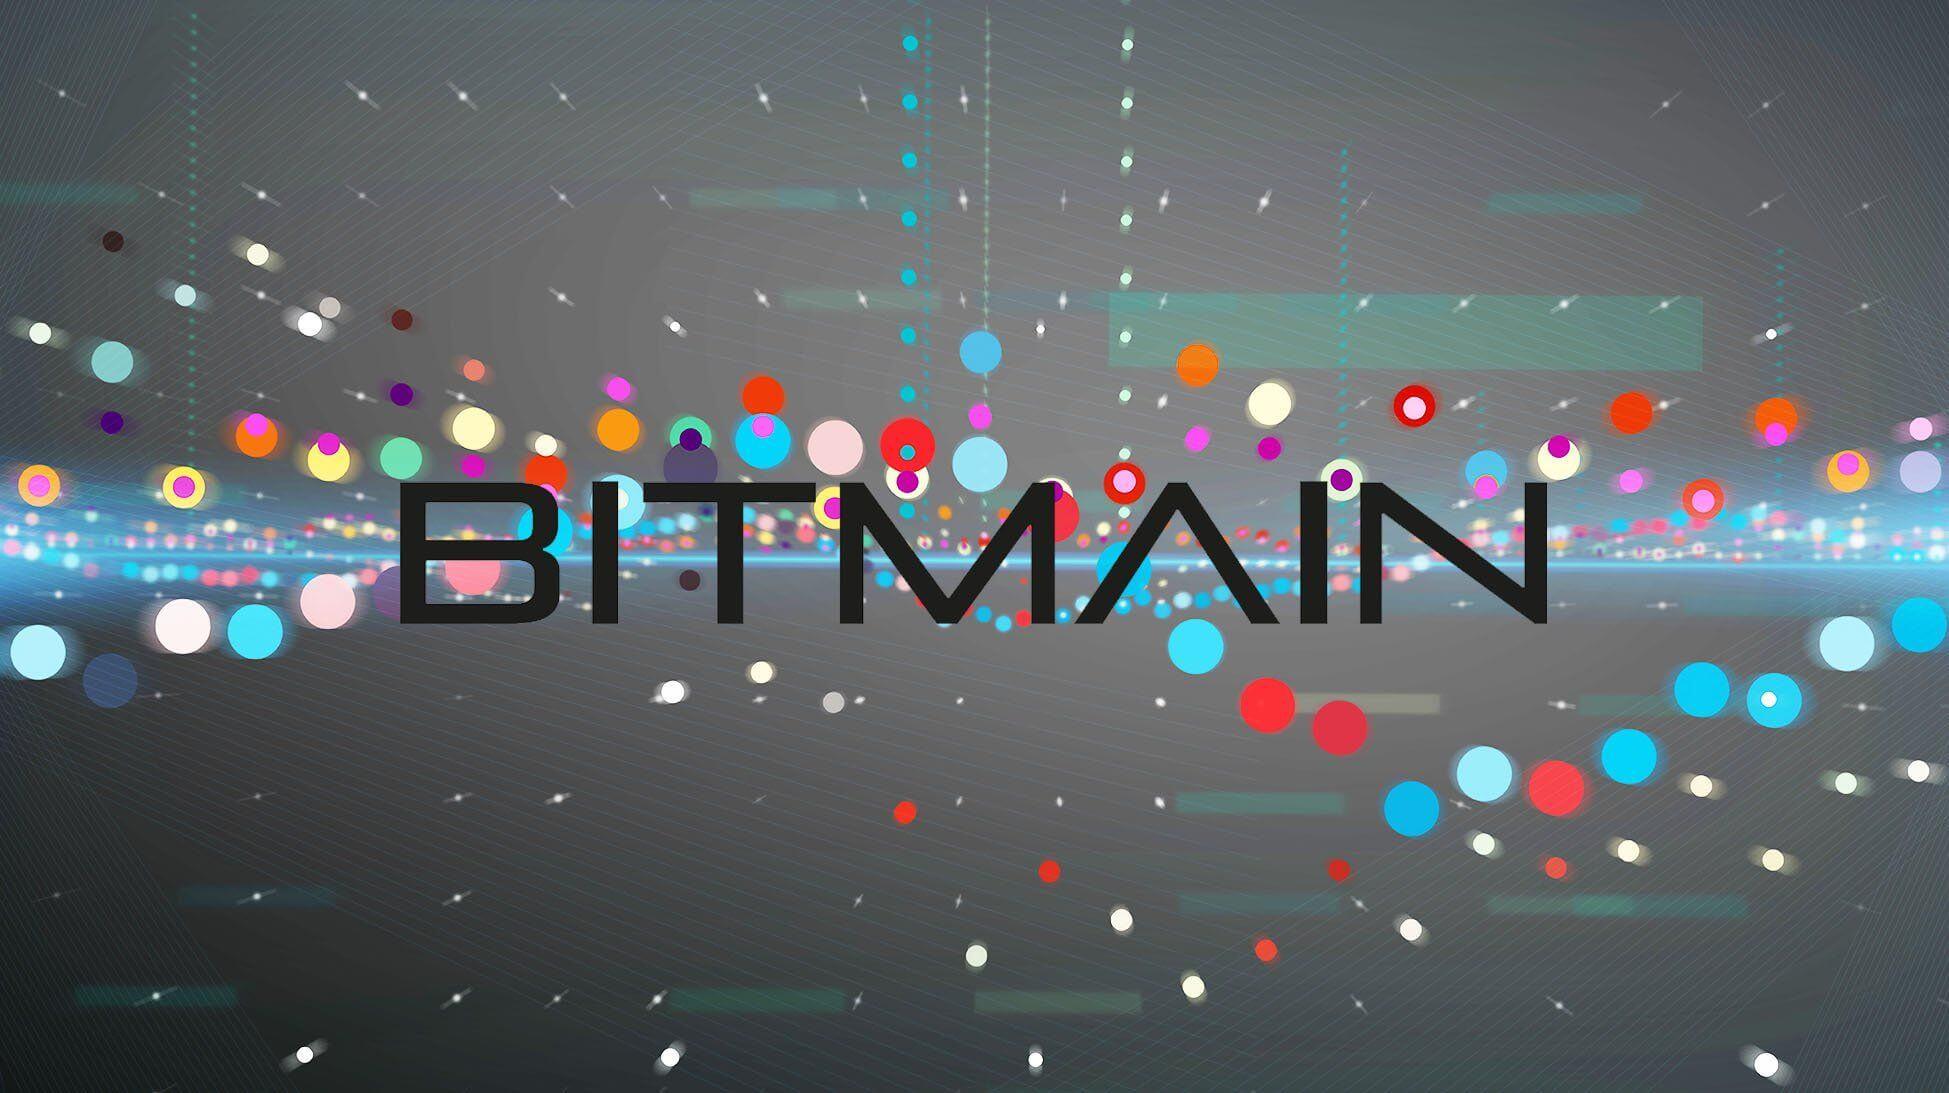 bitmain logo